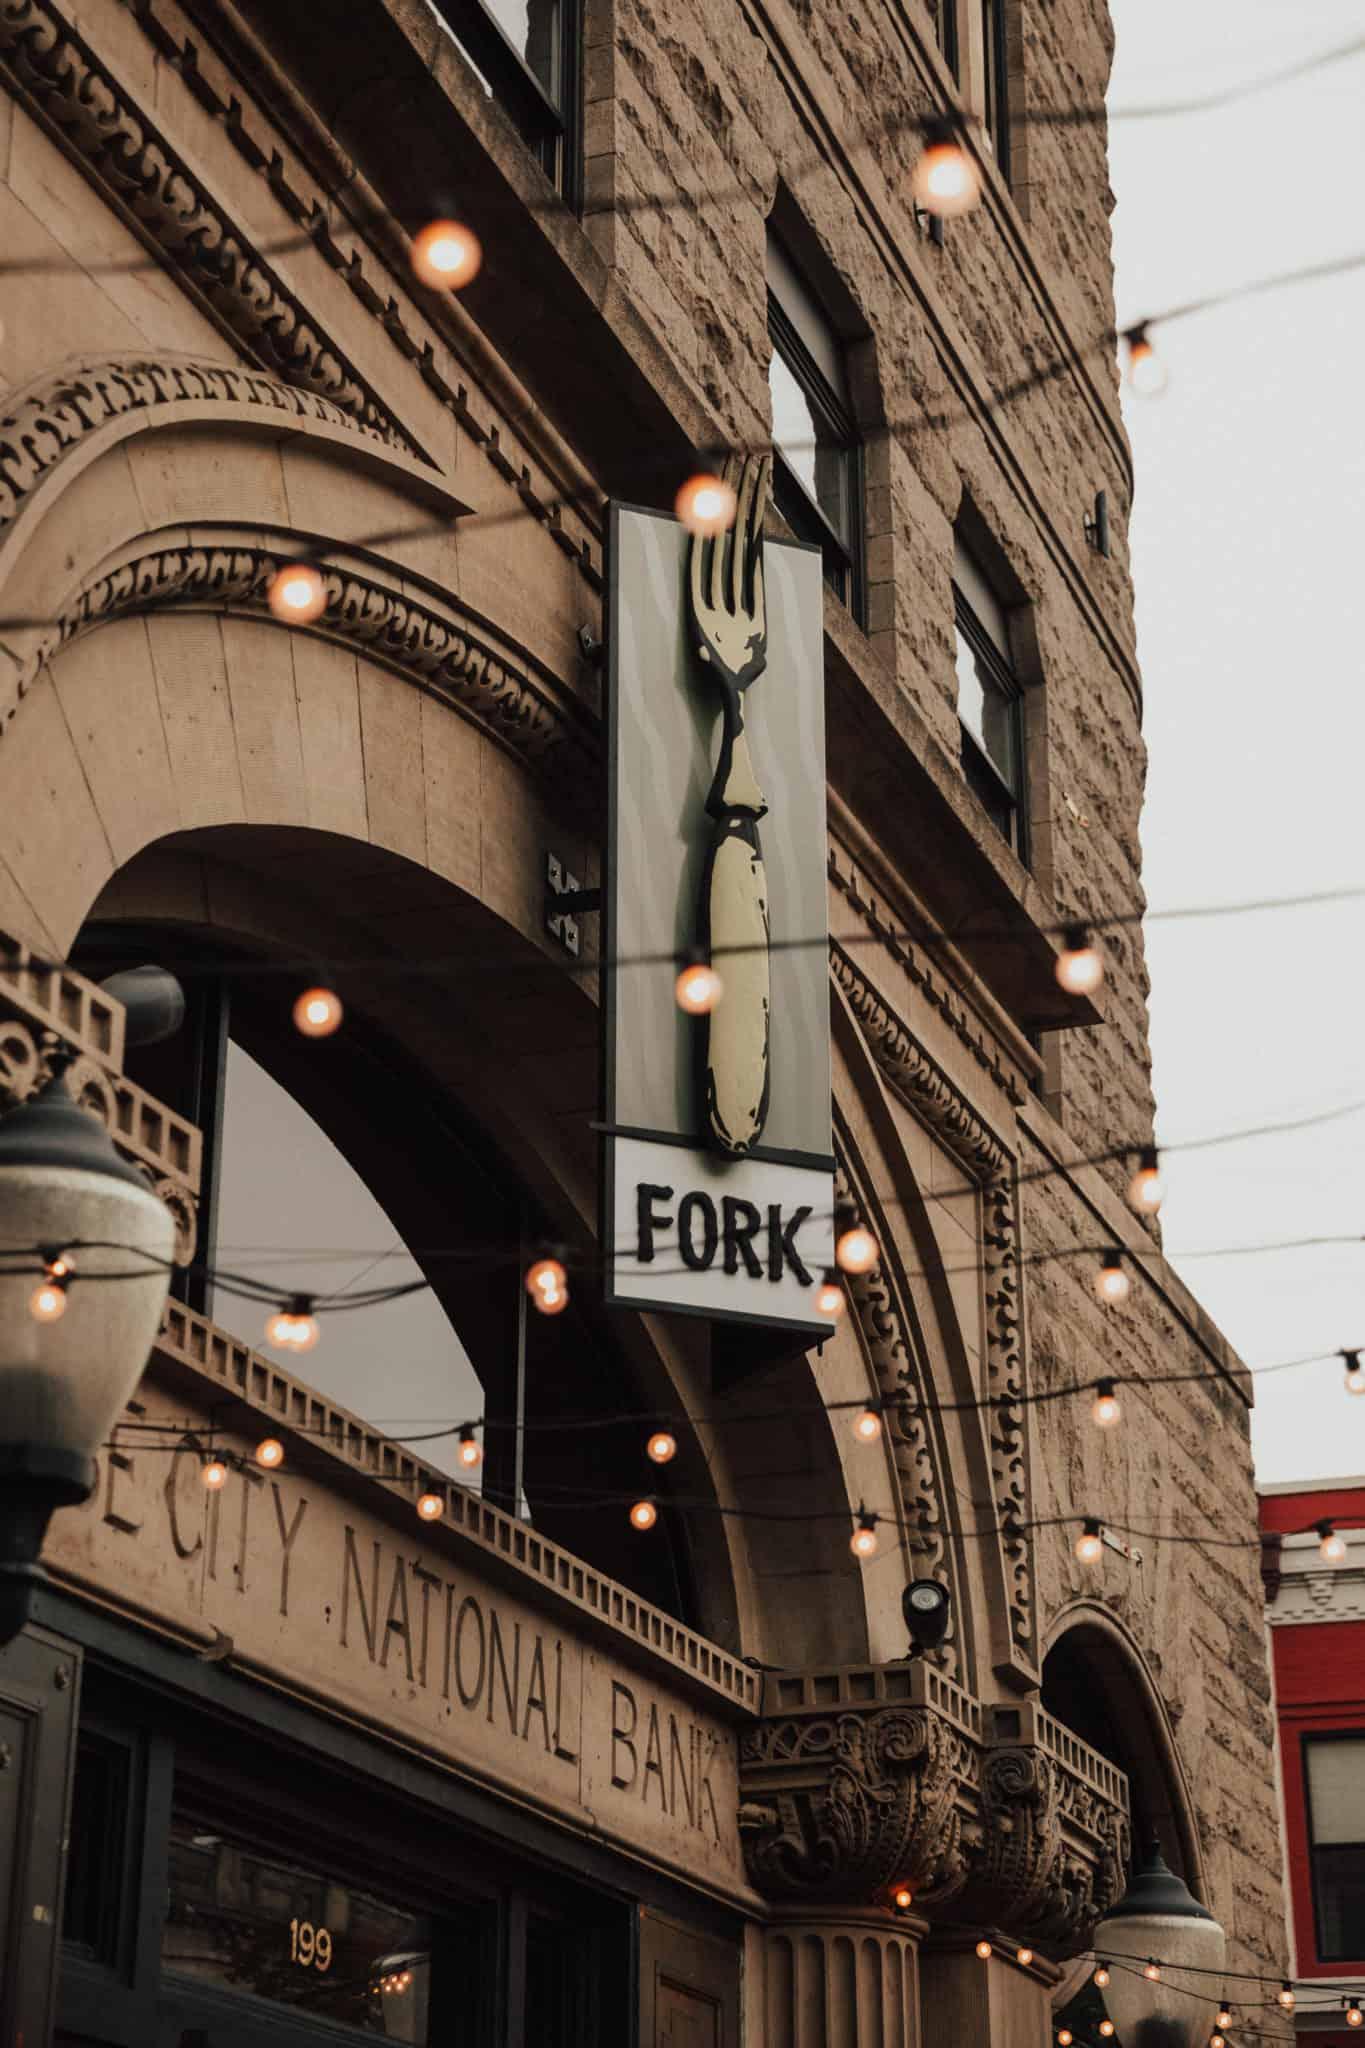 Fork Restaurant Exterior View, Boise, Idaho